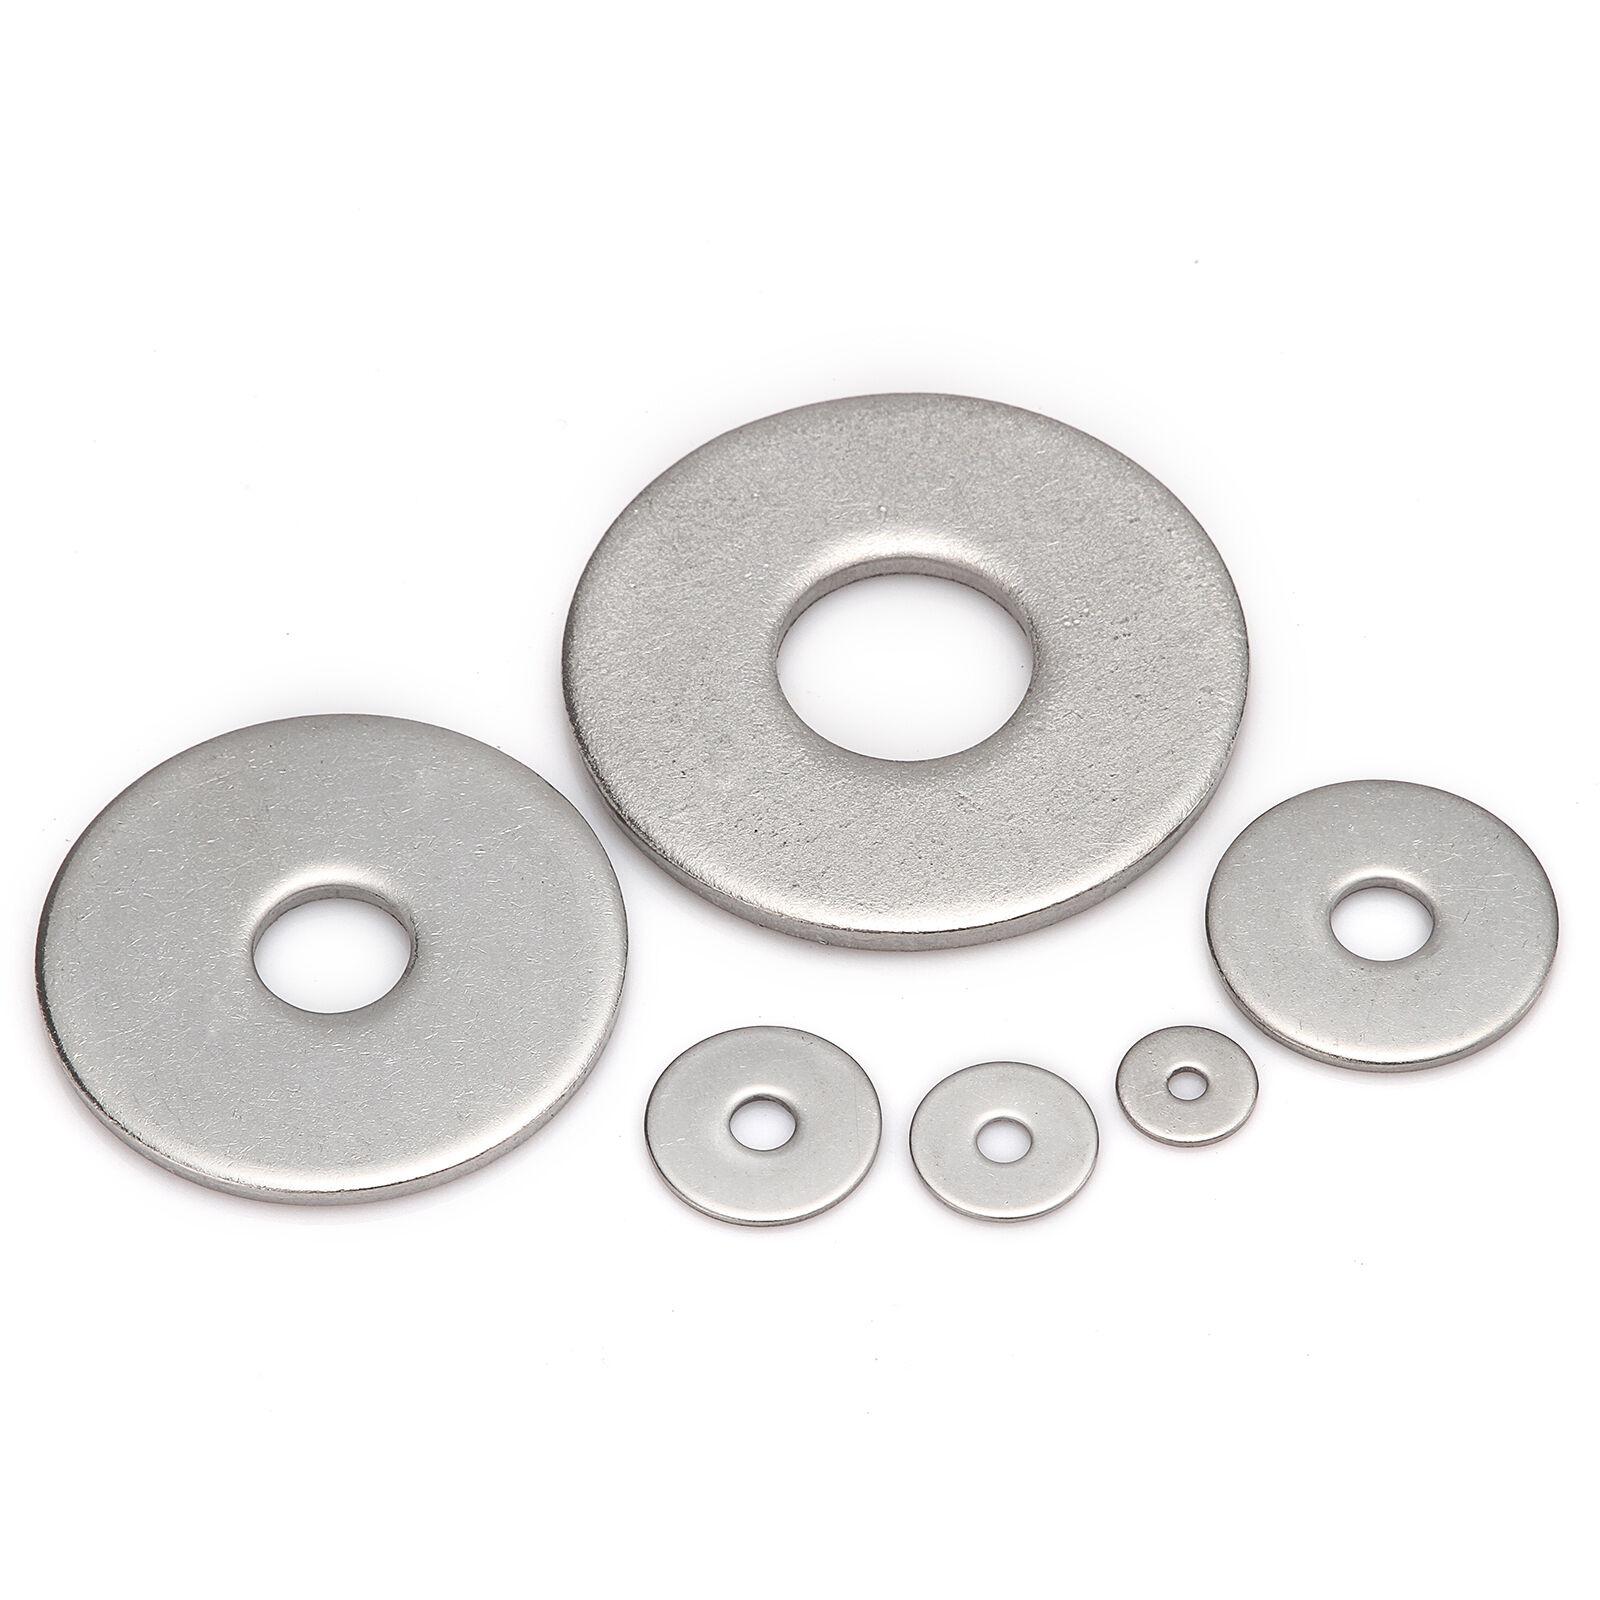 M3 M4 M5 M6 M8 M10 M12 M14 M16 M20 A2 Stainless Steel Penny Repair Flat Washers 5